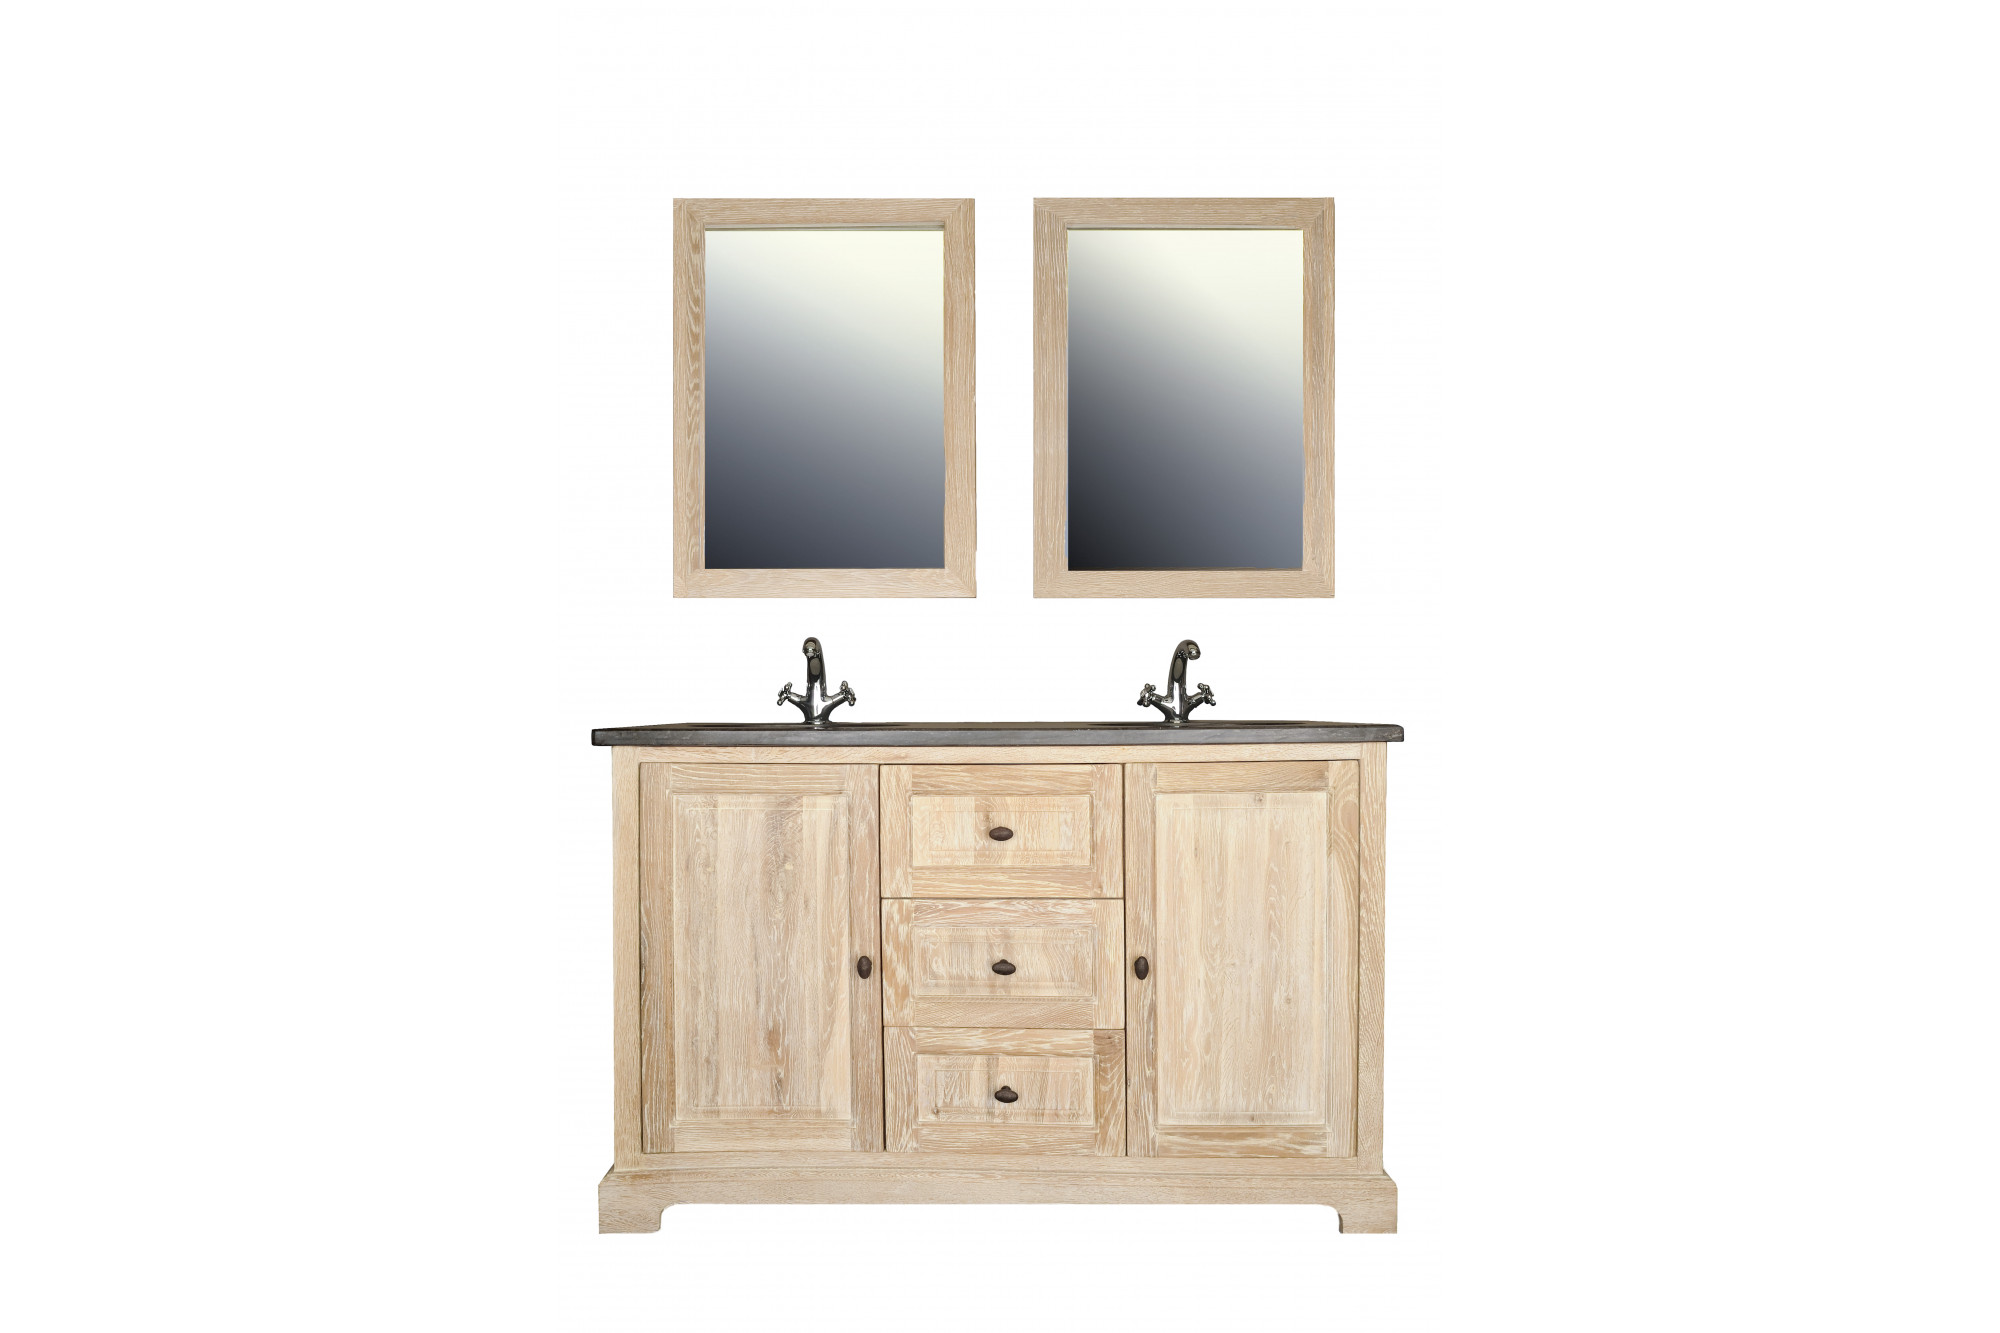 ensemble salle Ensemble de salle de bain en chêne massif blanchi, avec double vasque -  Hellin